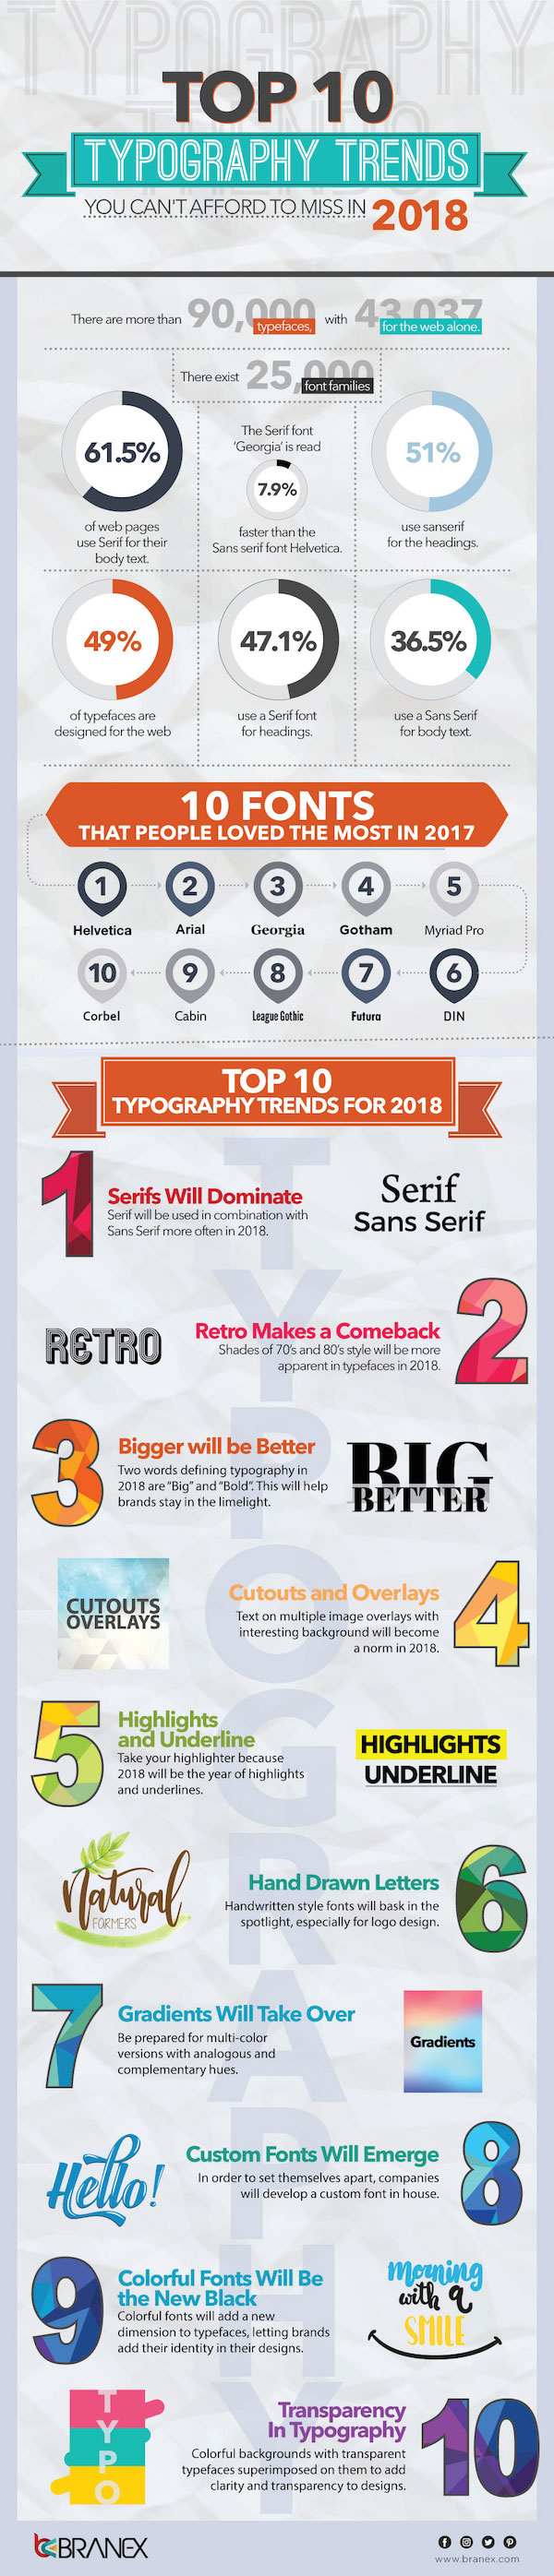 Tendencias tipográficas 2018